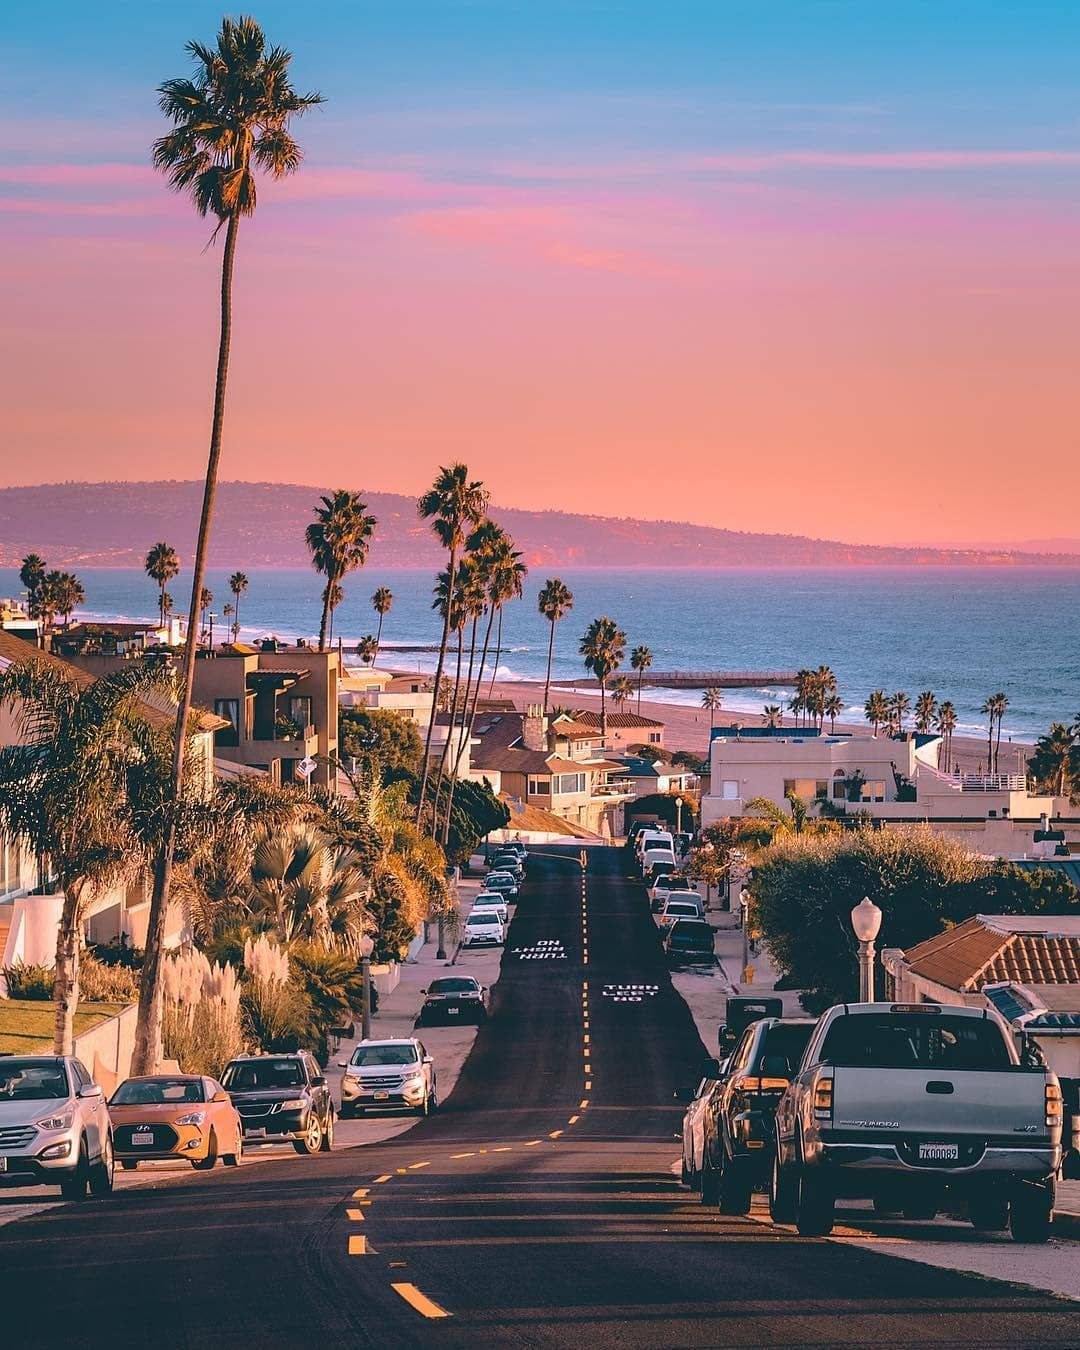 "FashionBeans on Instagram ""Los Angeles > everywhere else"